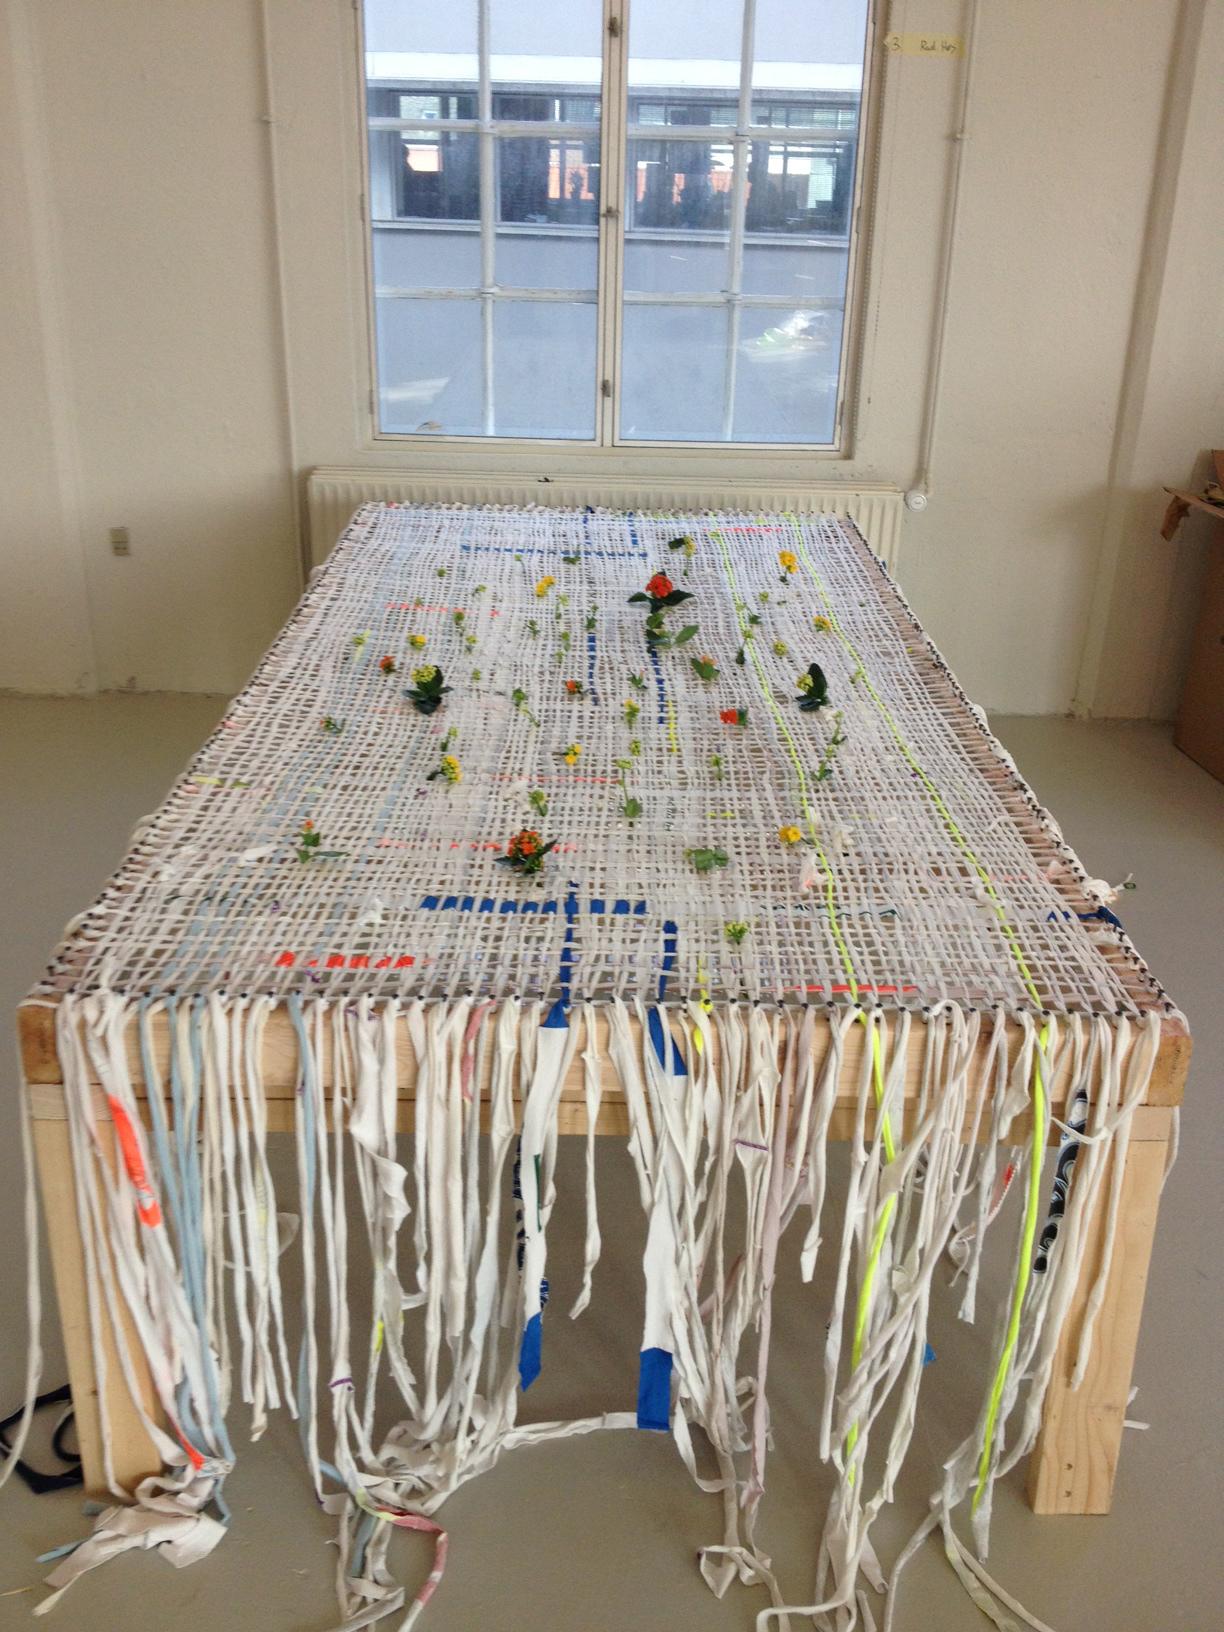 Phoebe Washburn/Kunsthalle-Brandts